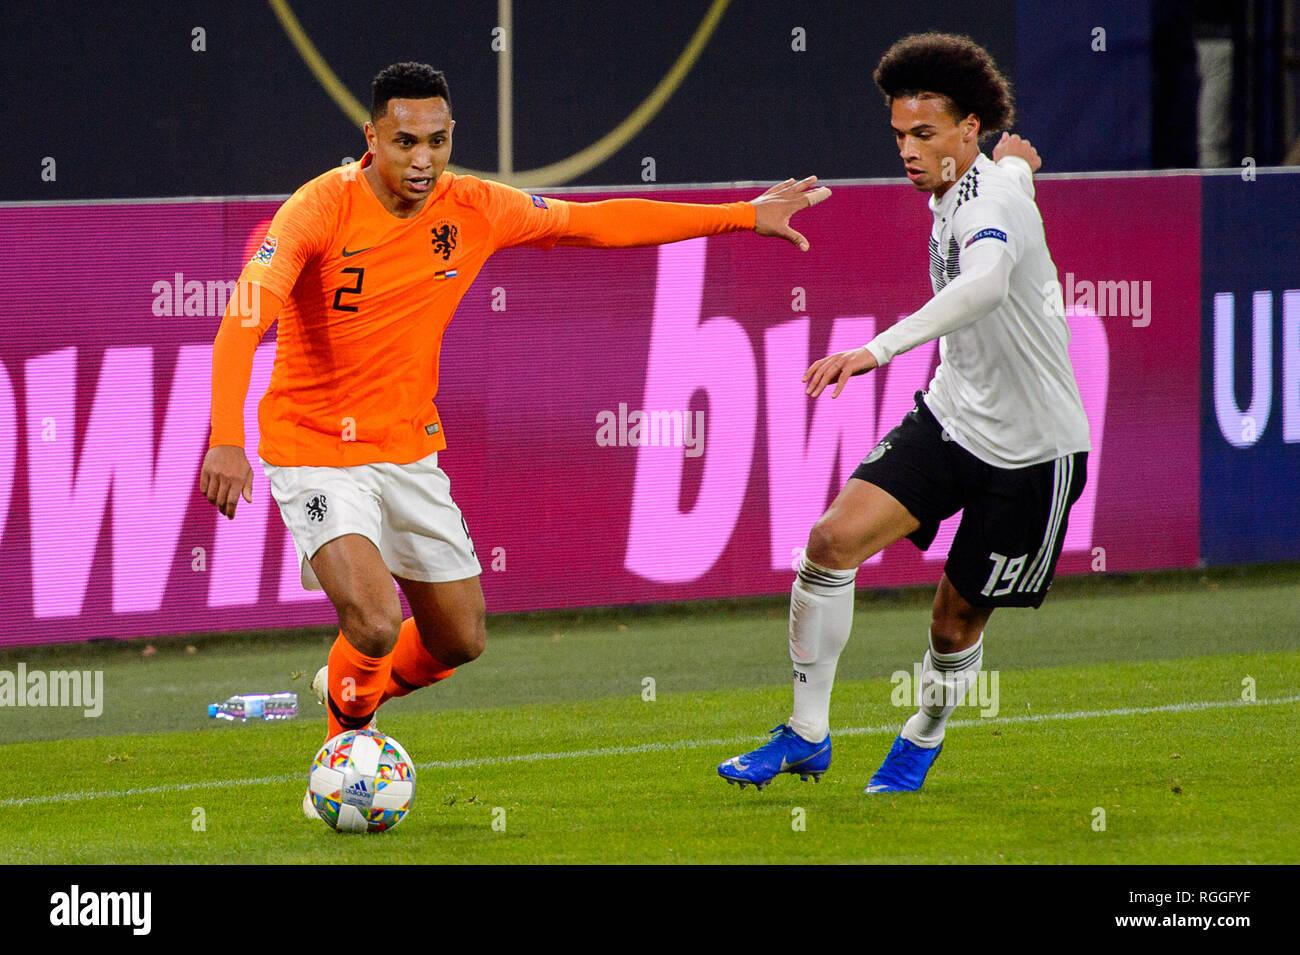 GELSENKIRCHEN - NOV 19, 2018: Kenny Tete 2 with a ball. Germany - Netherlands. UEFA Nations League. Schalke 04 stadium. - Stock Image